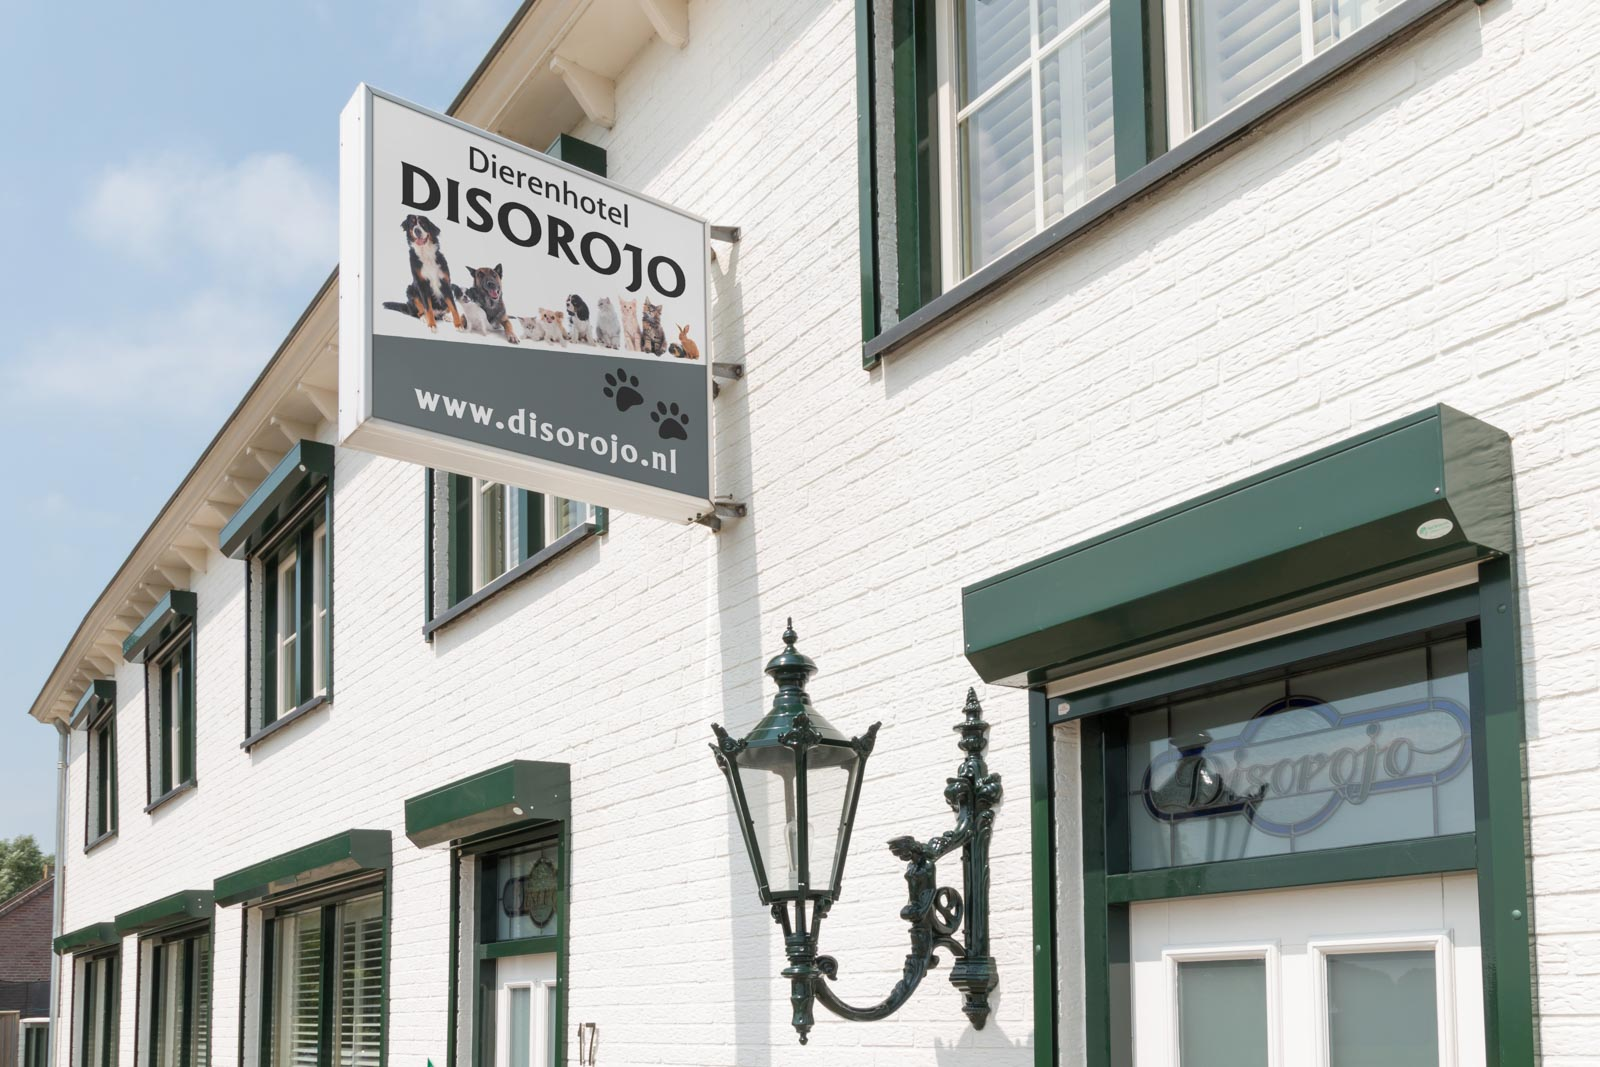 Exterior Dierenhotel Disorojo